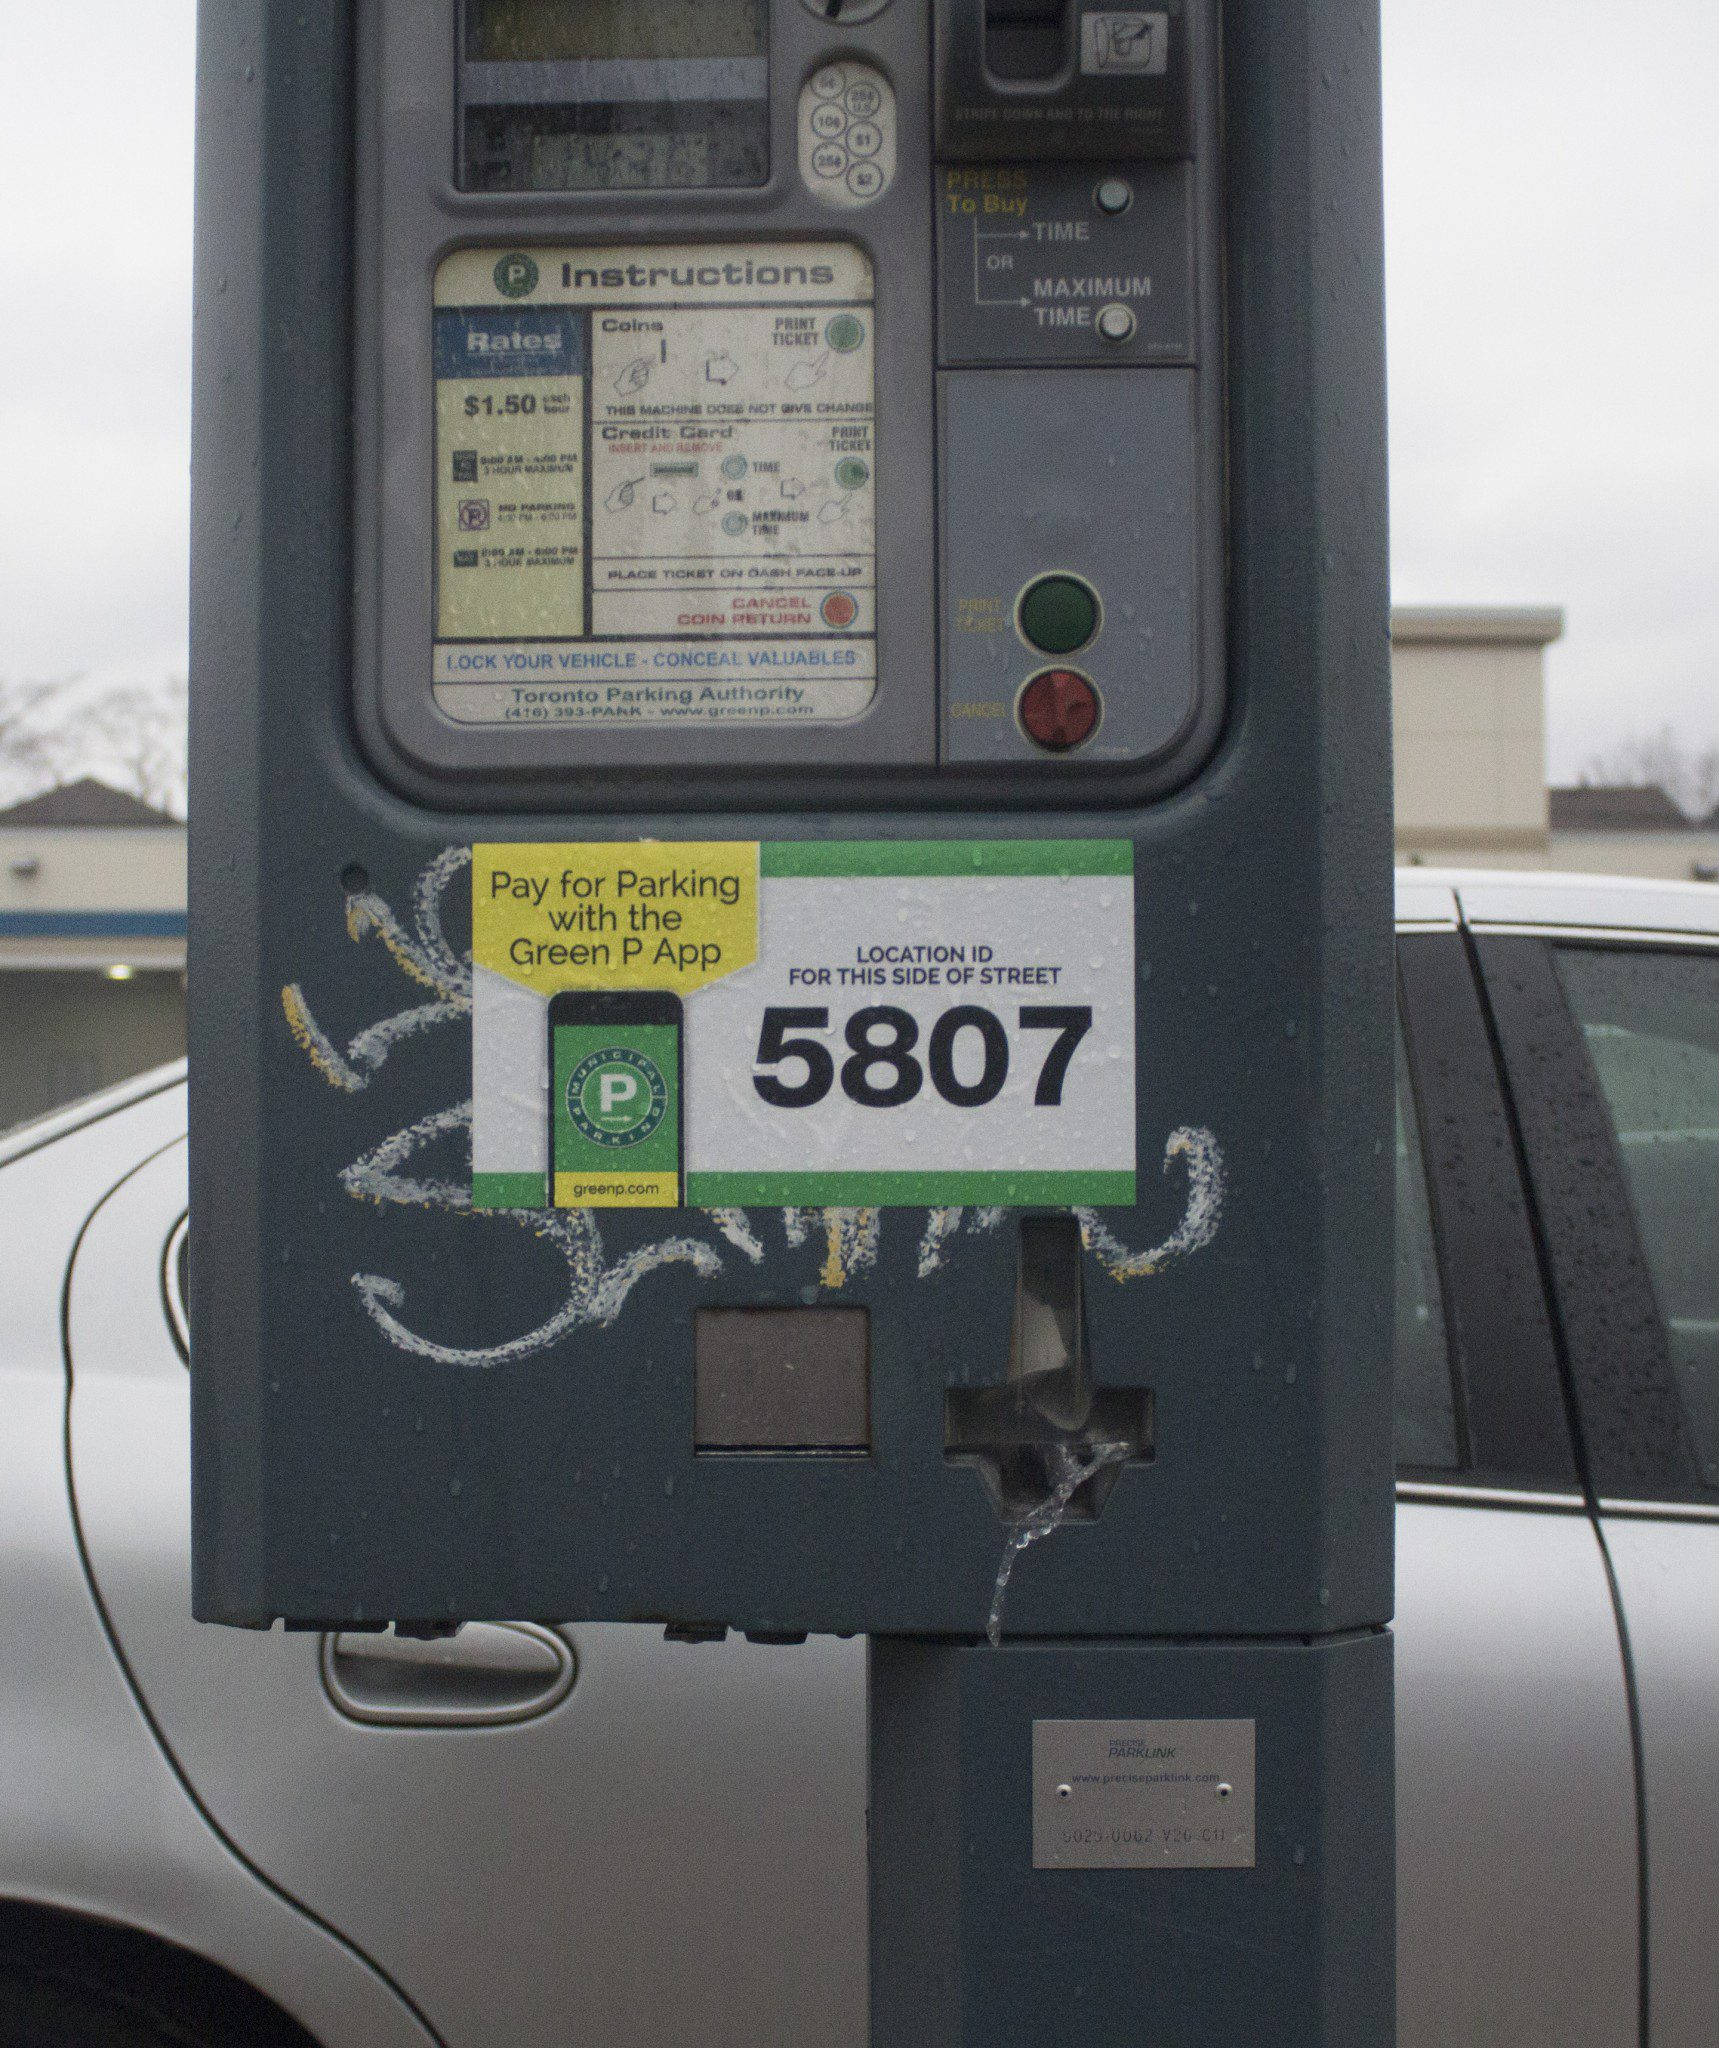 sticker covers graffiti on parking meter